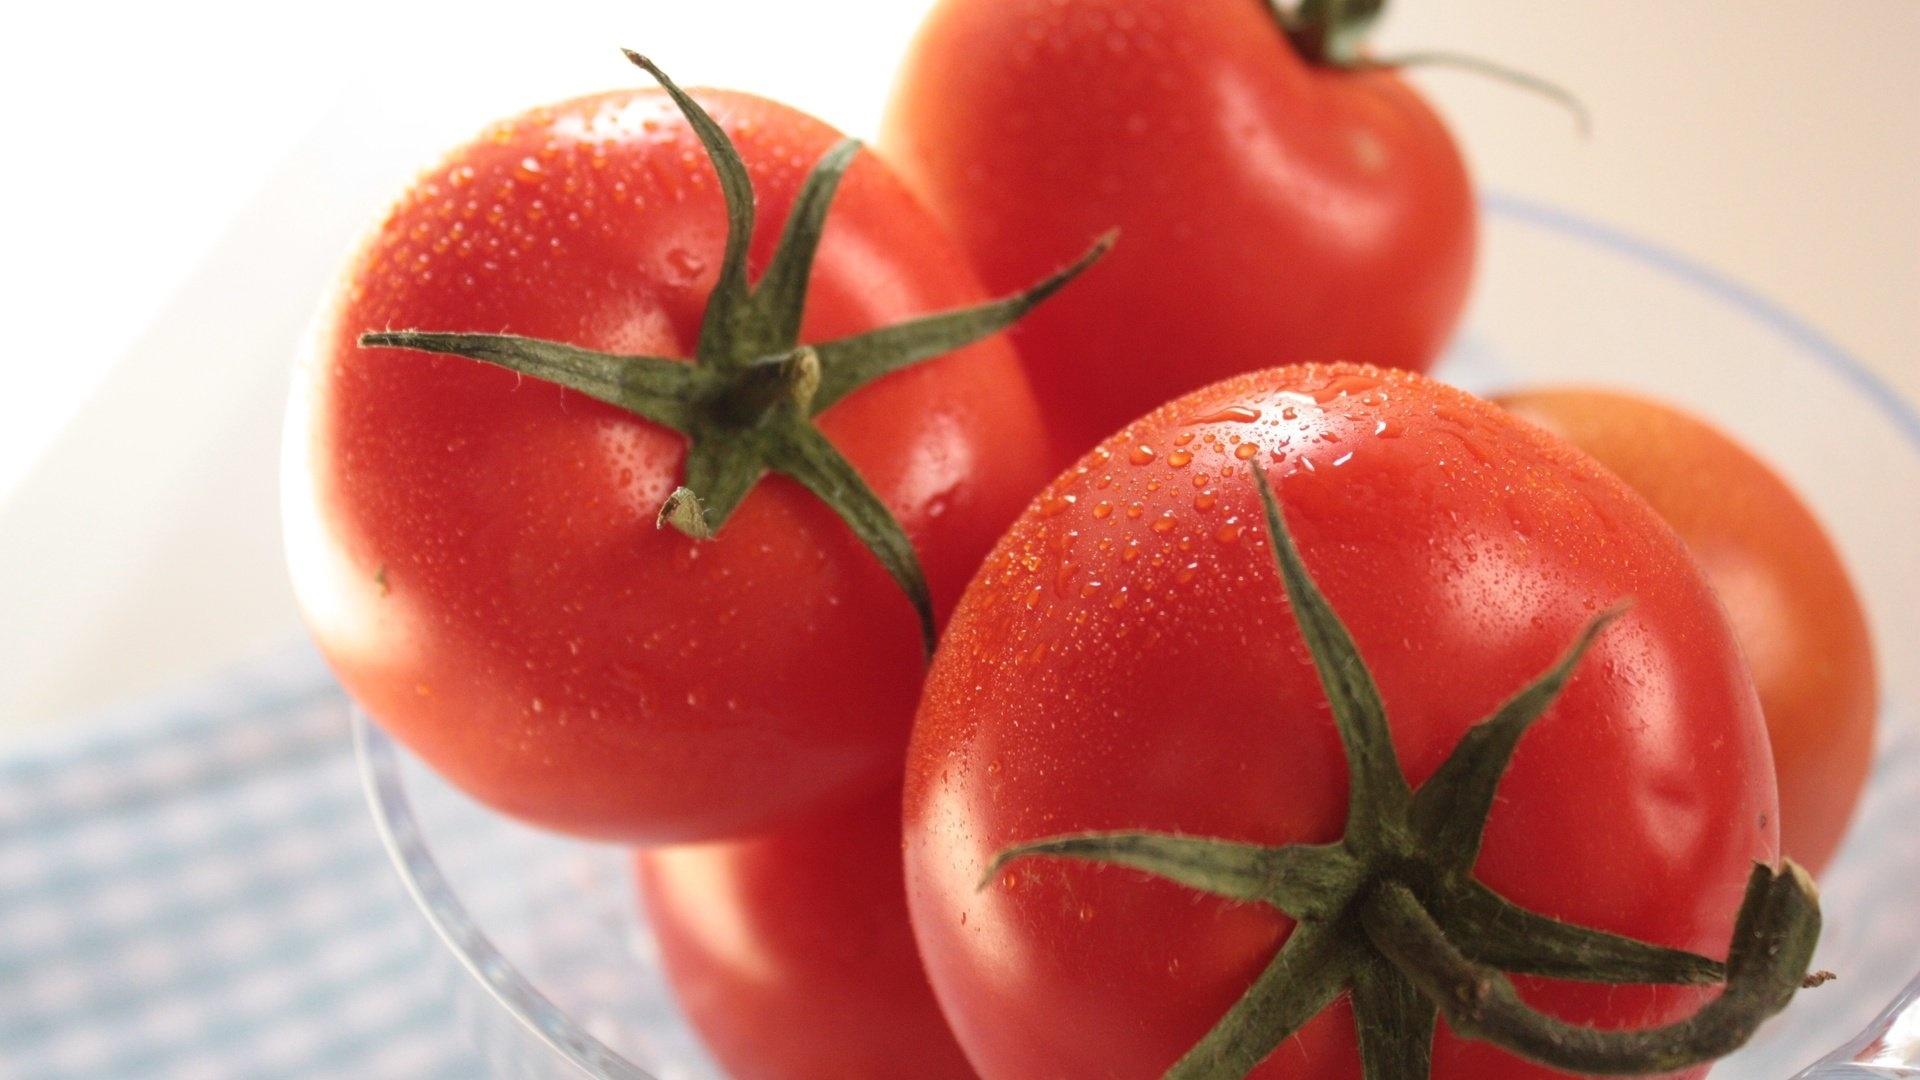 Tomatoes Wallpaper theme